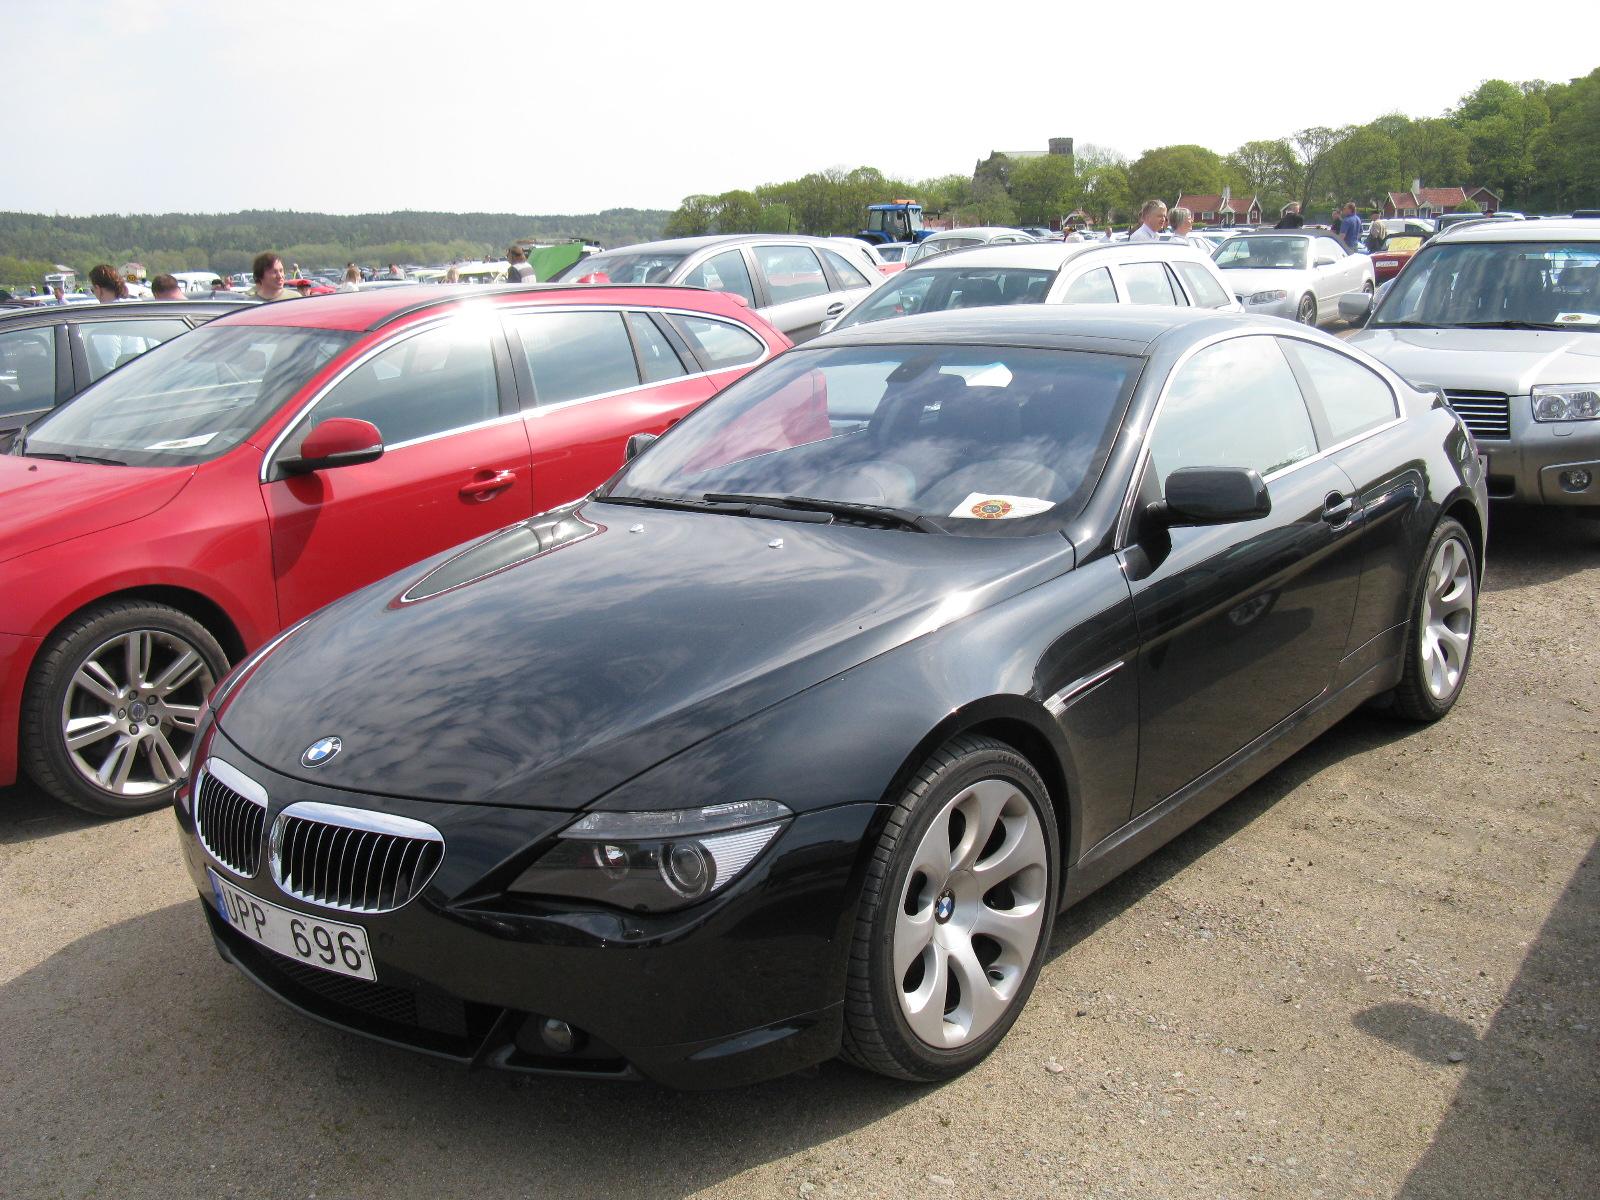 BMW 6 Series Wiki & Review